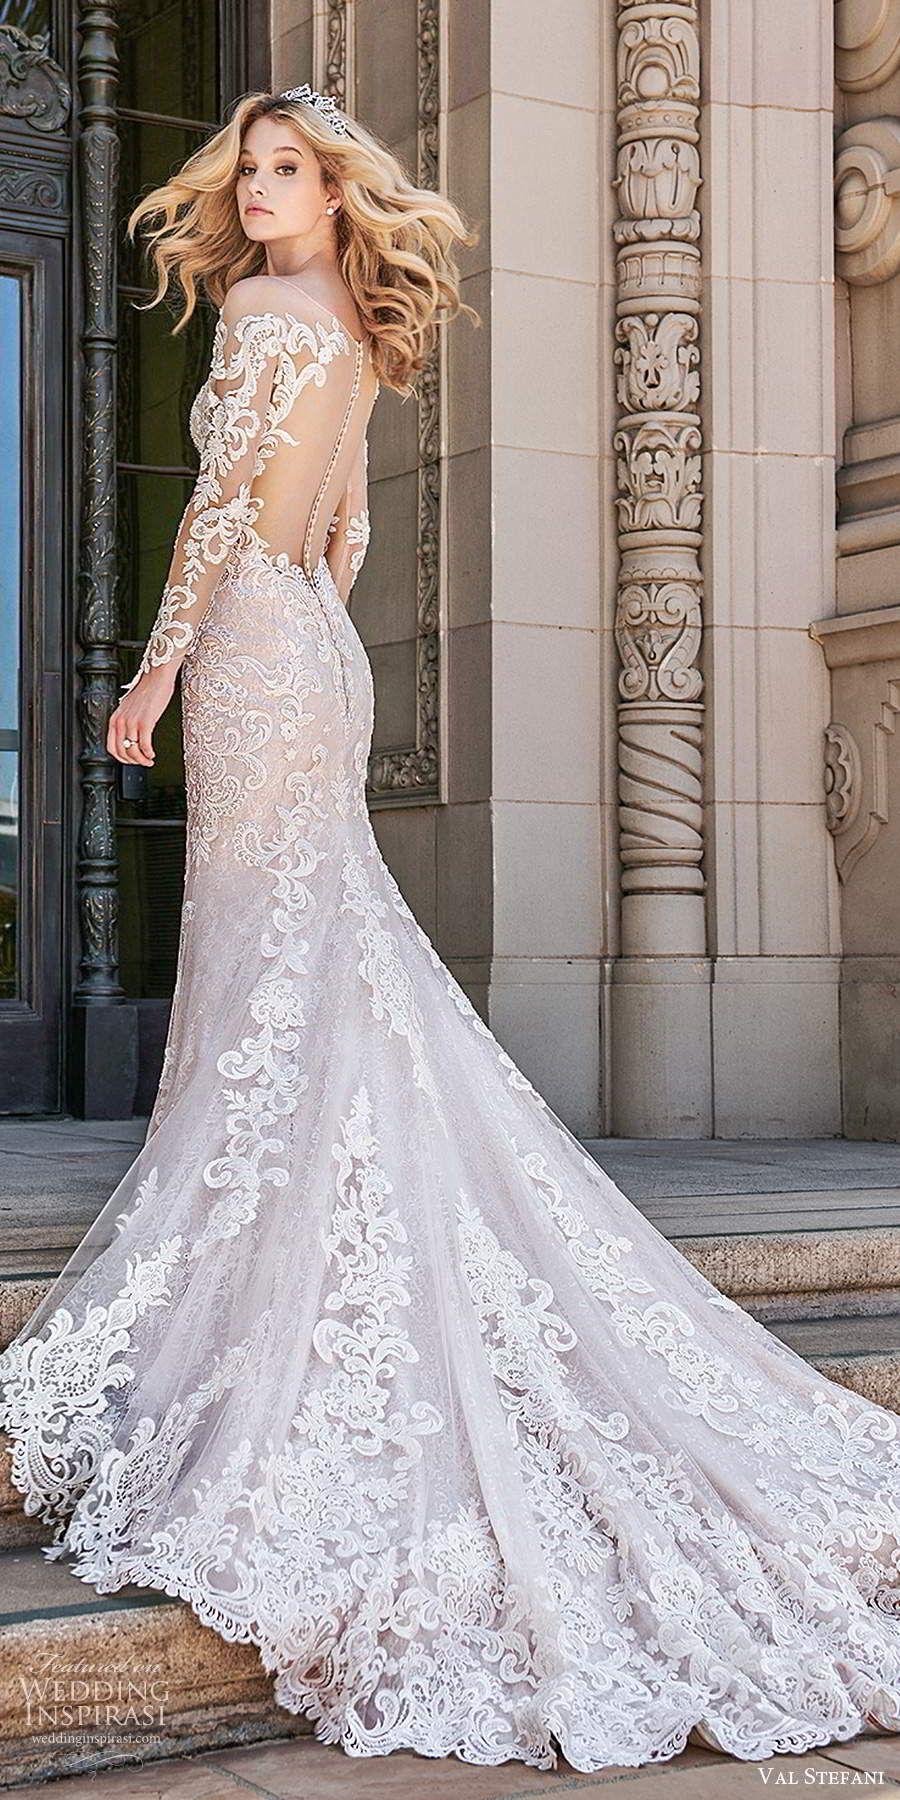 Val Stefani Spring 2020 Wedding Dresses Wedding Inspirasi Wedding Dress Long Sleeve Wedding Gowns Mermaid Wedding Dress Illusion Back [ 1800 x 900 Pixel ]